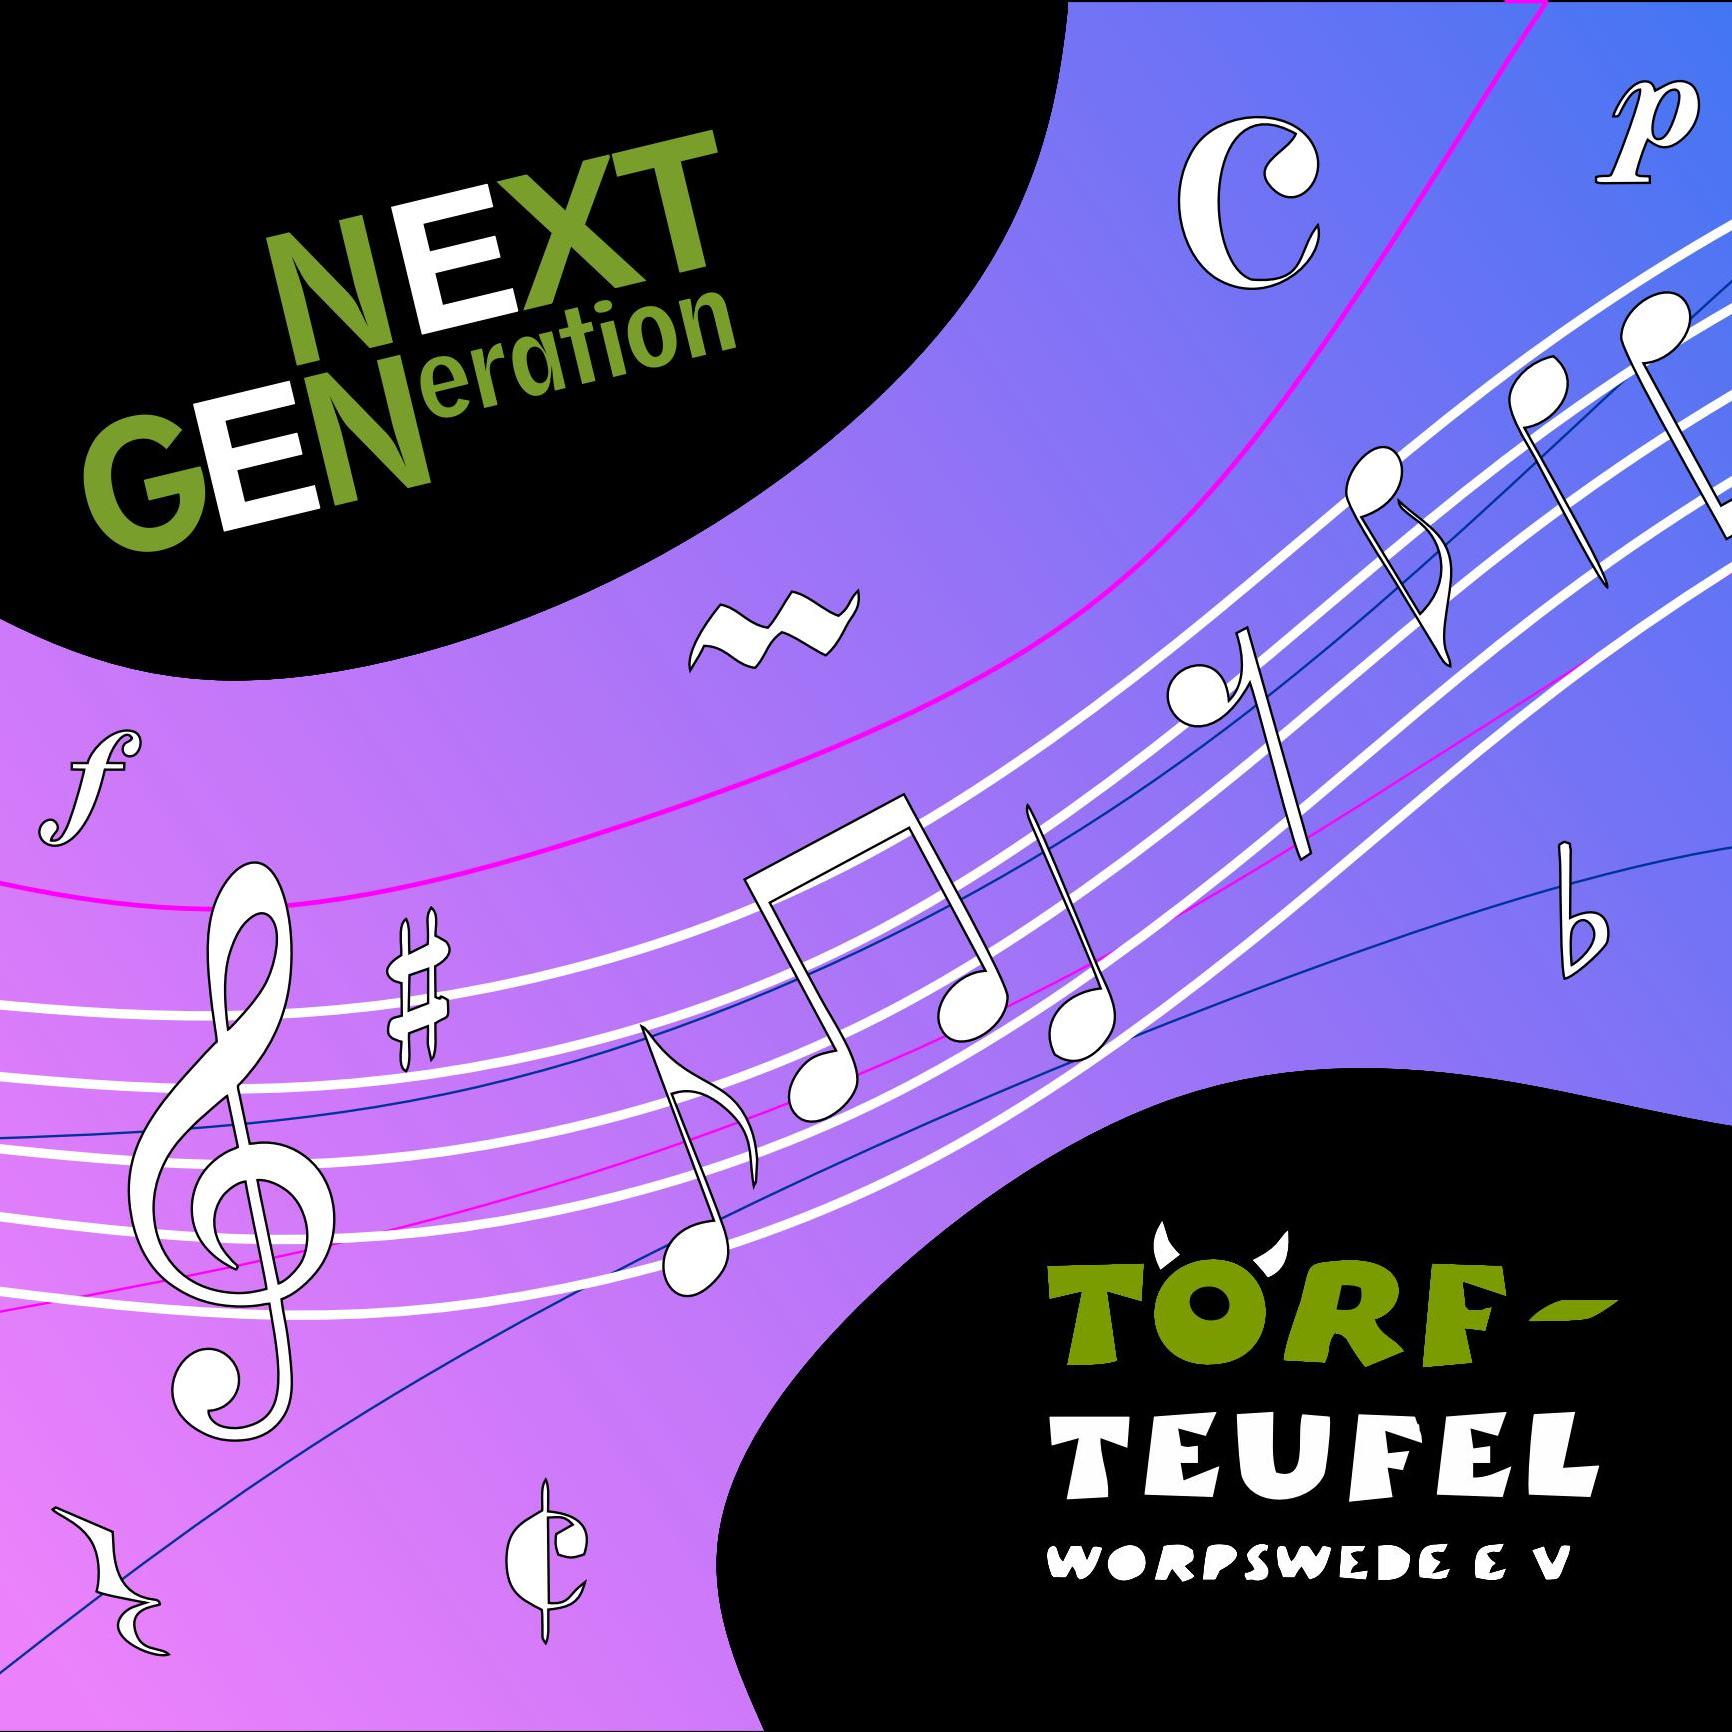 https://www.torfteufel-worpswede.de/wp-content/uploads/2021/02/Next-Generation.jpg